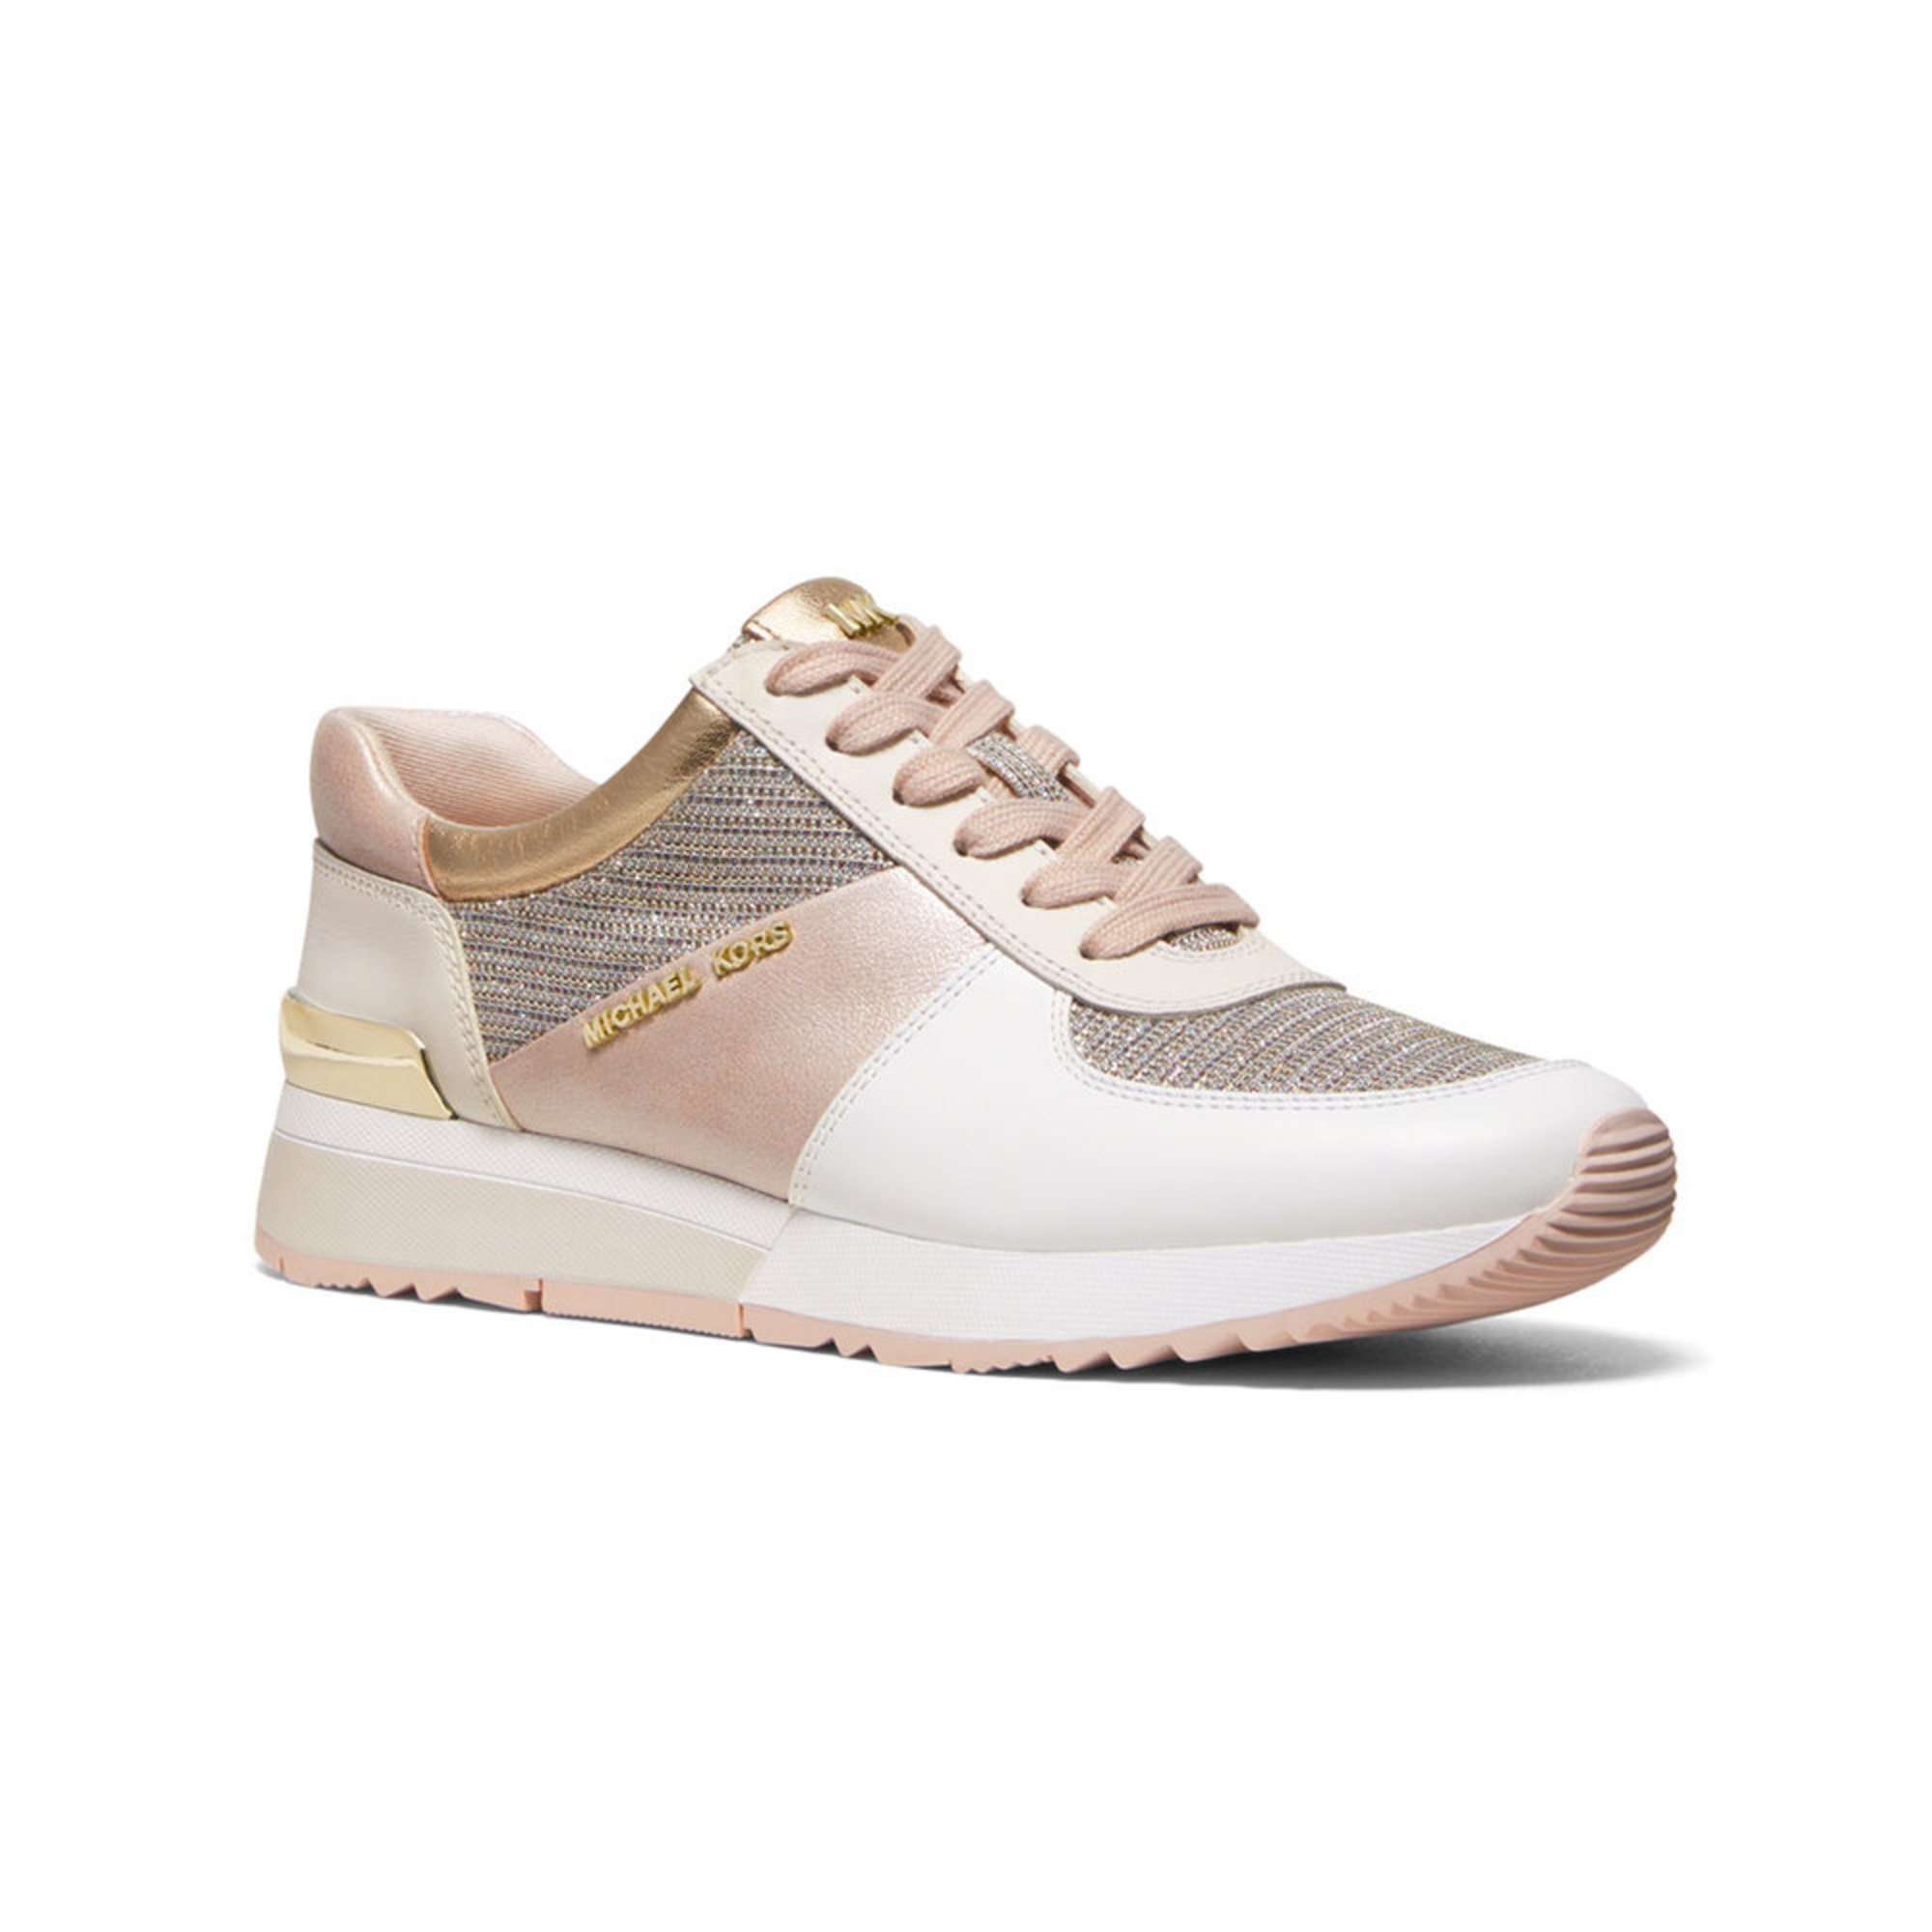 28859131 Michael Kors Women's Allie Trainer | Women's Sneakers | Shoes - Shop ...